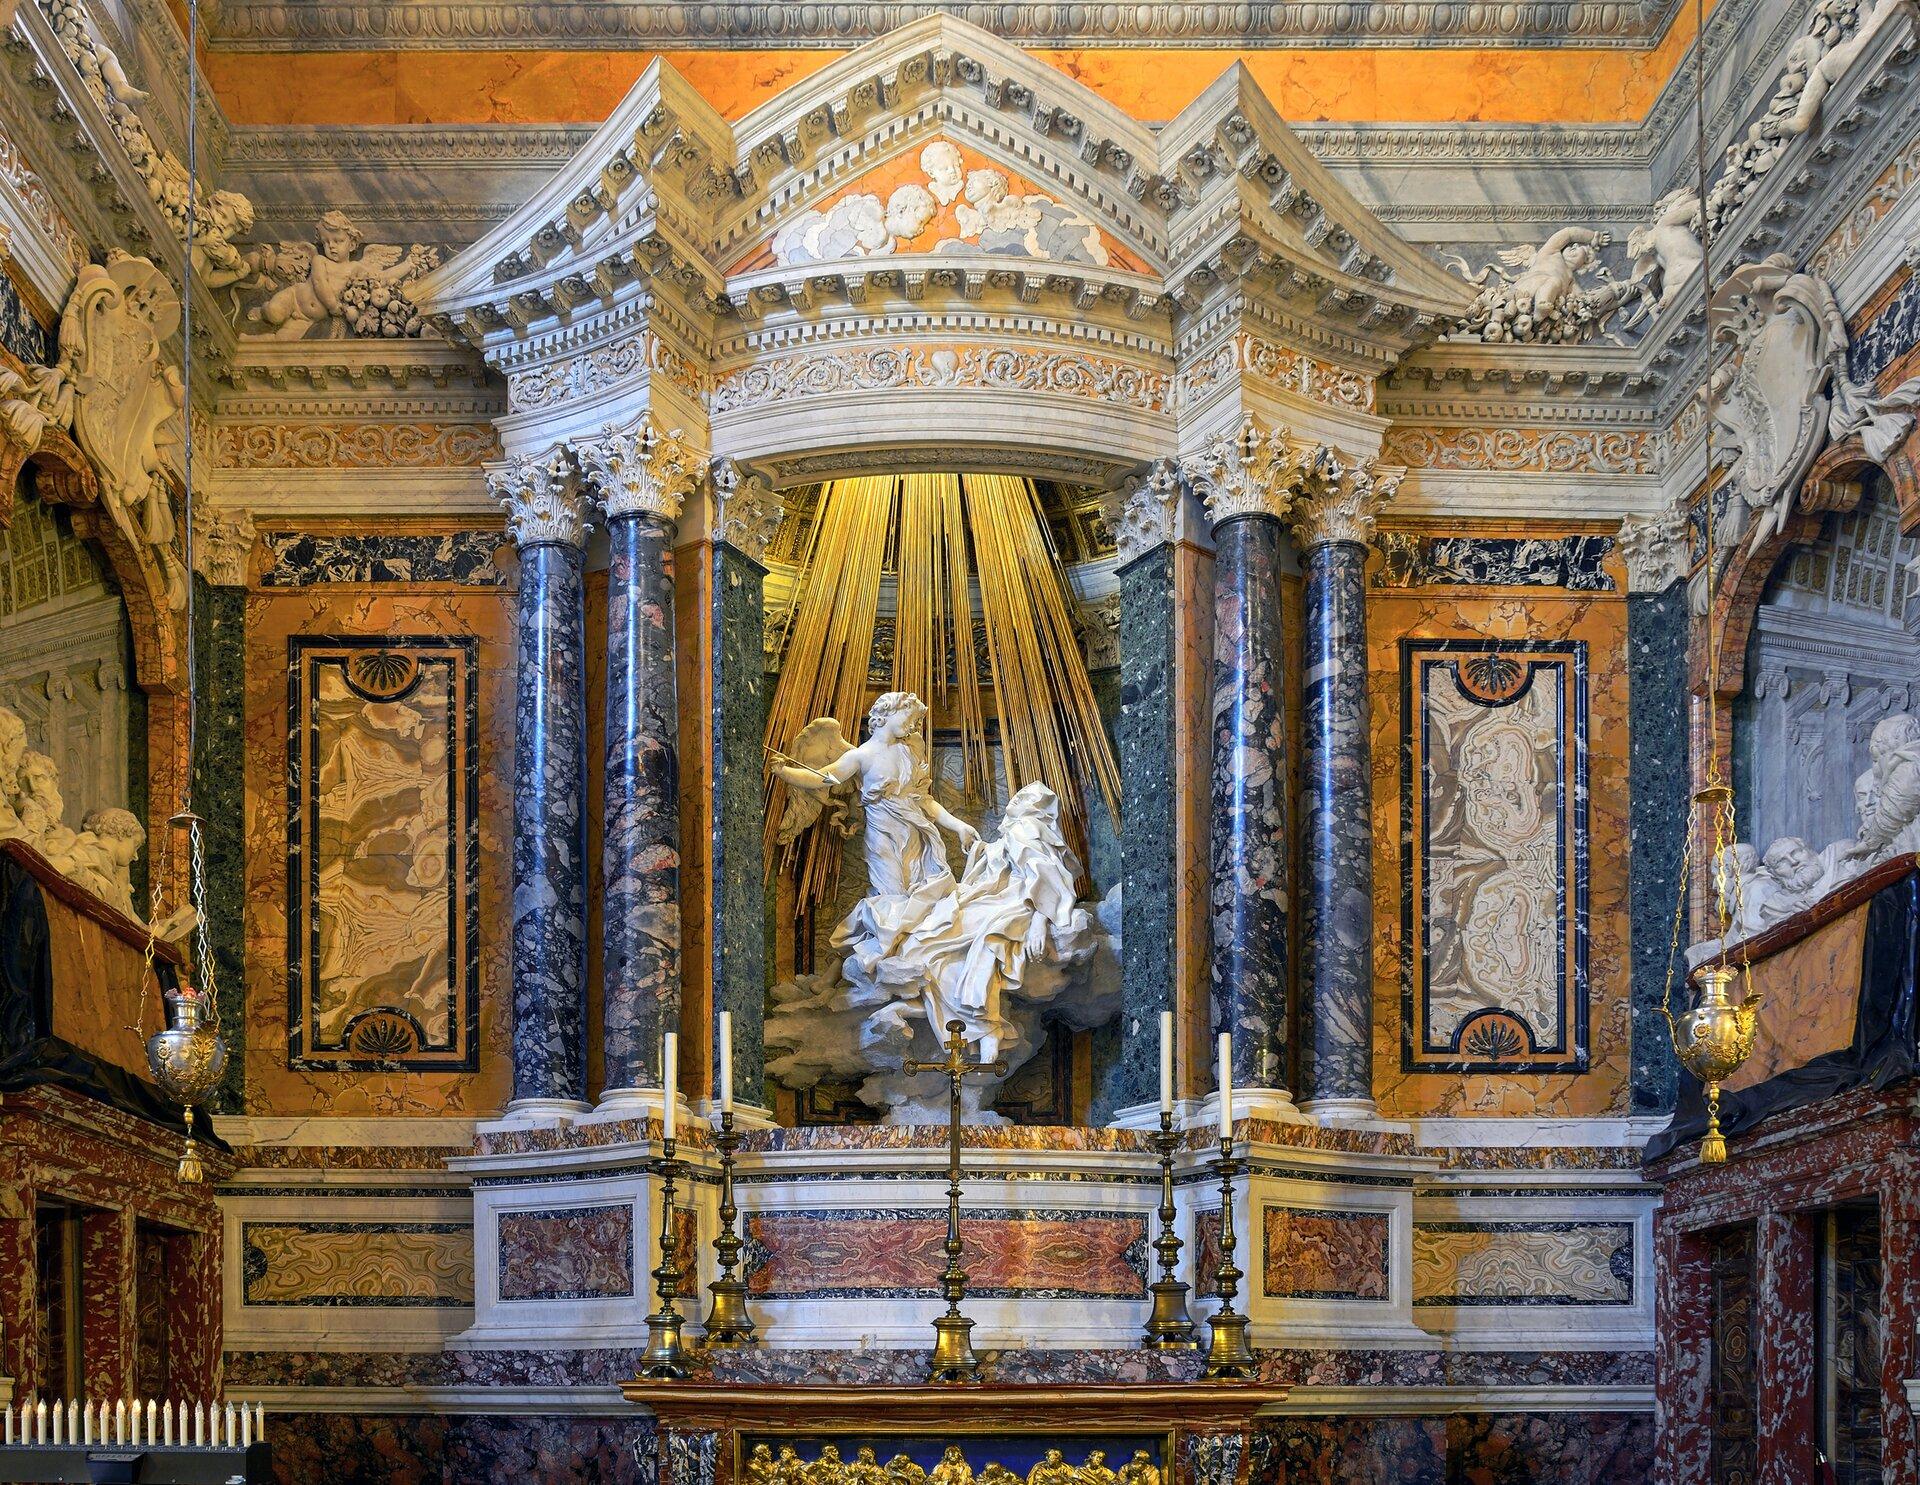 Ekstaza świętej Teresy we wnętrzu kaplicy Cornaro wSanta Maria della Vittoria Ekstaza świętej Teresy we wnętrzu kaplicy Cornaro wSanta Maria della Vittoria Źródło: fot. Livioandronico2013 , Gianlorenzo Bernini, 1645–1652, licencja: CC BY-SA 4.0.